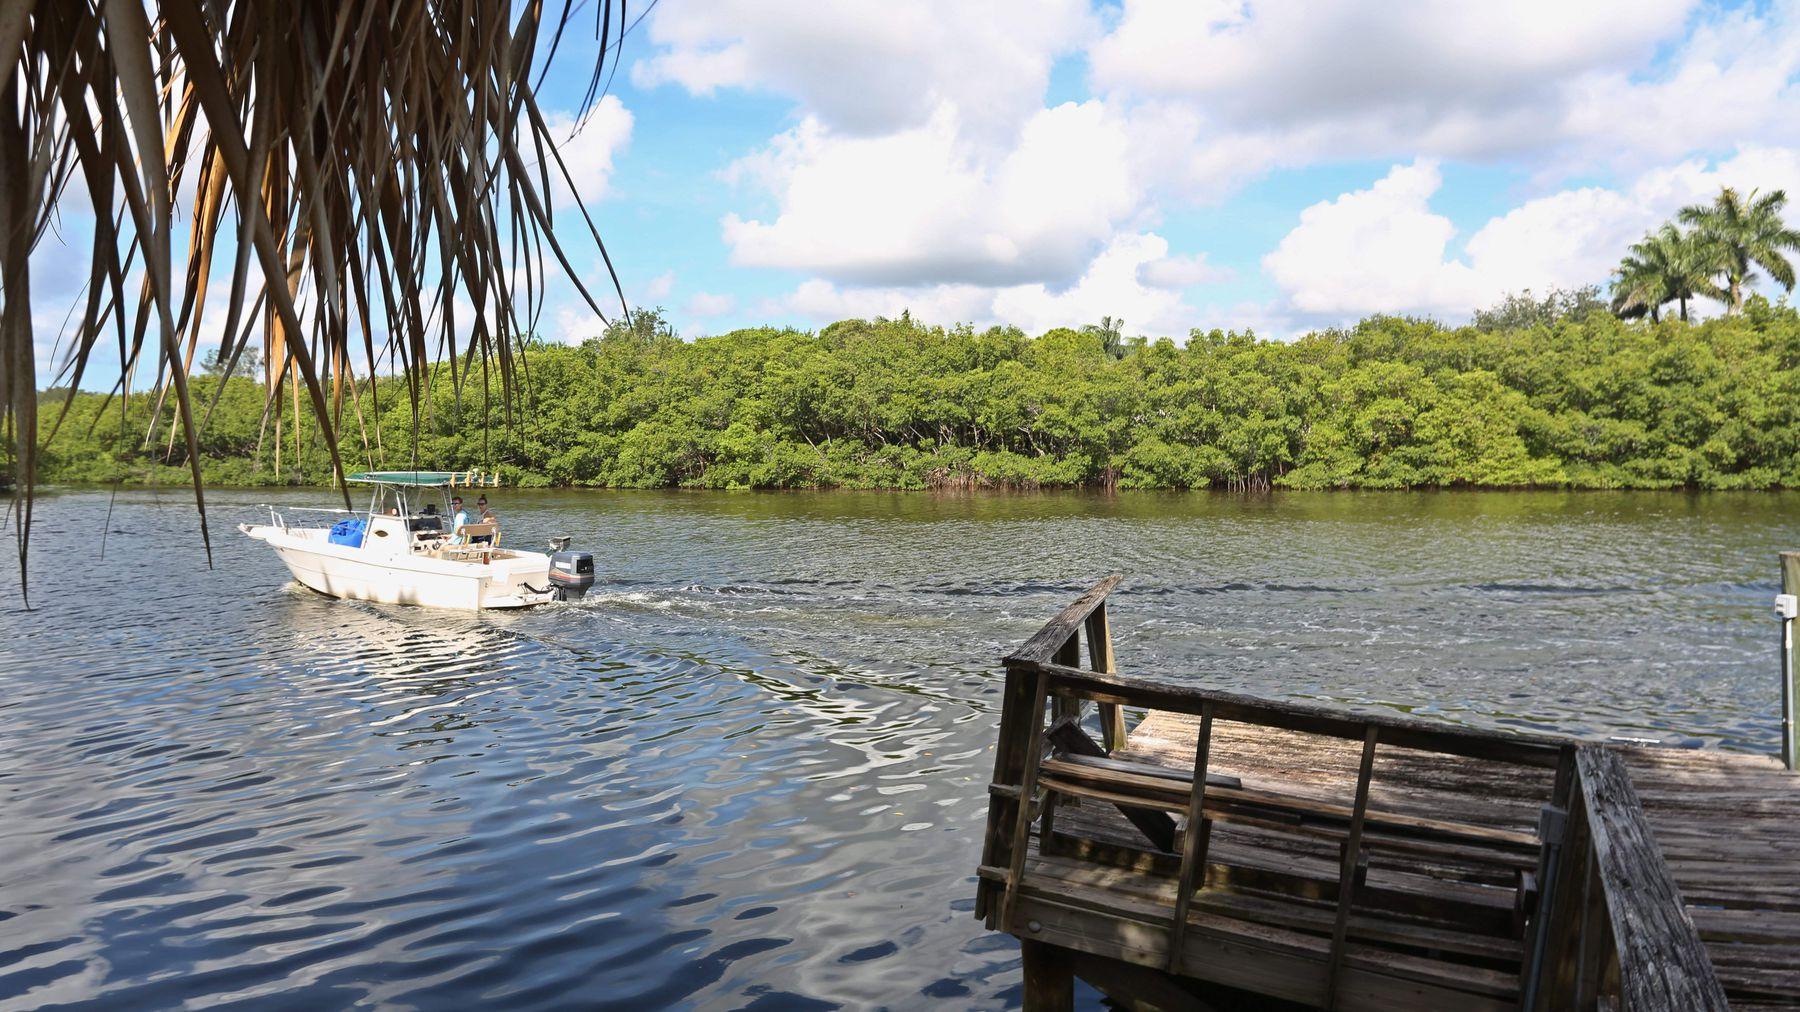 Placido Bay Mangroves